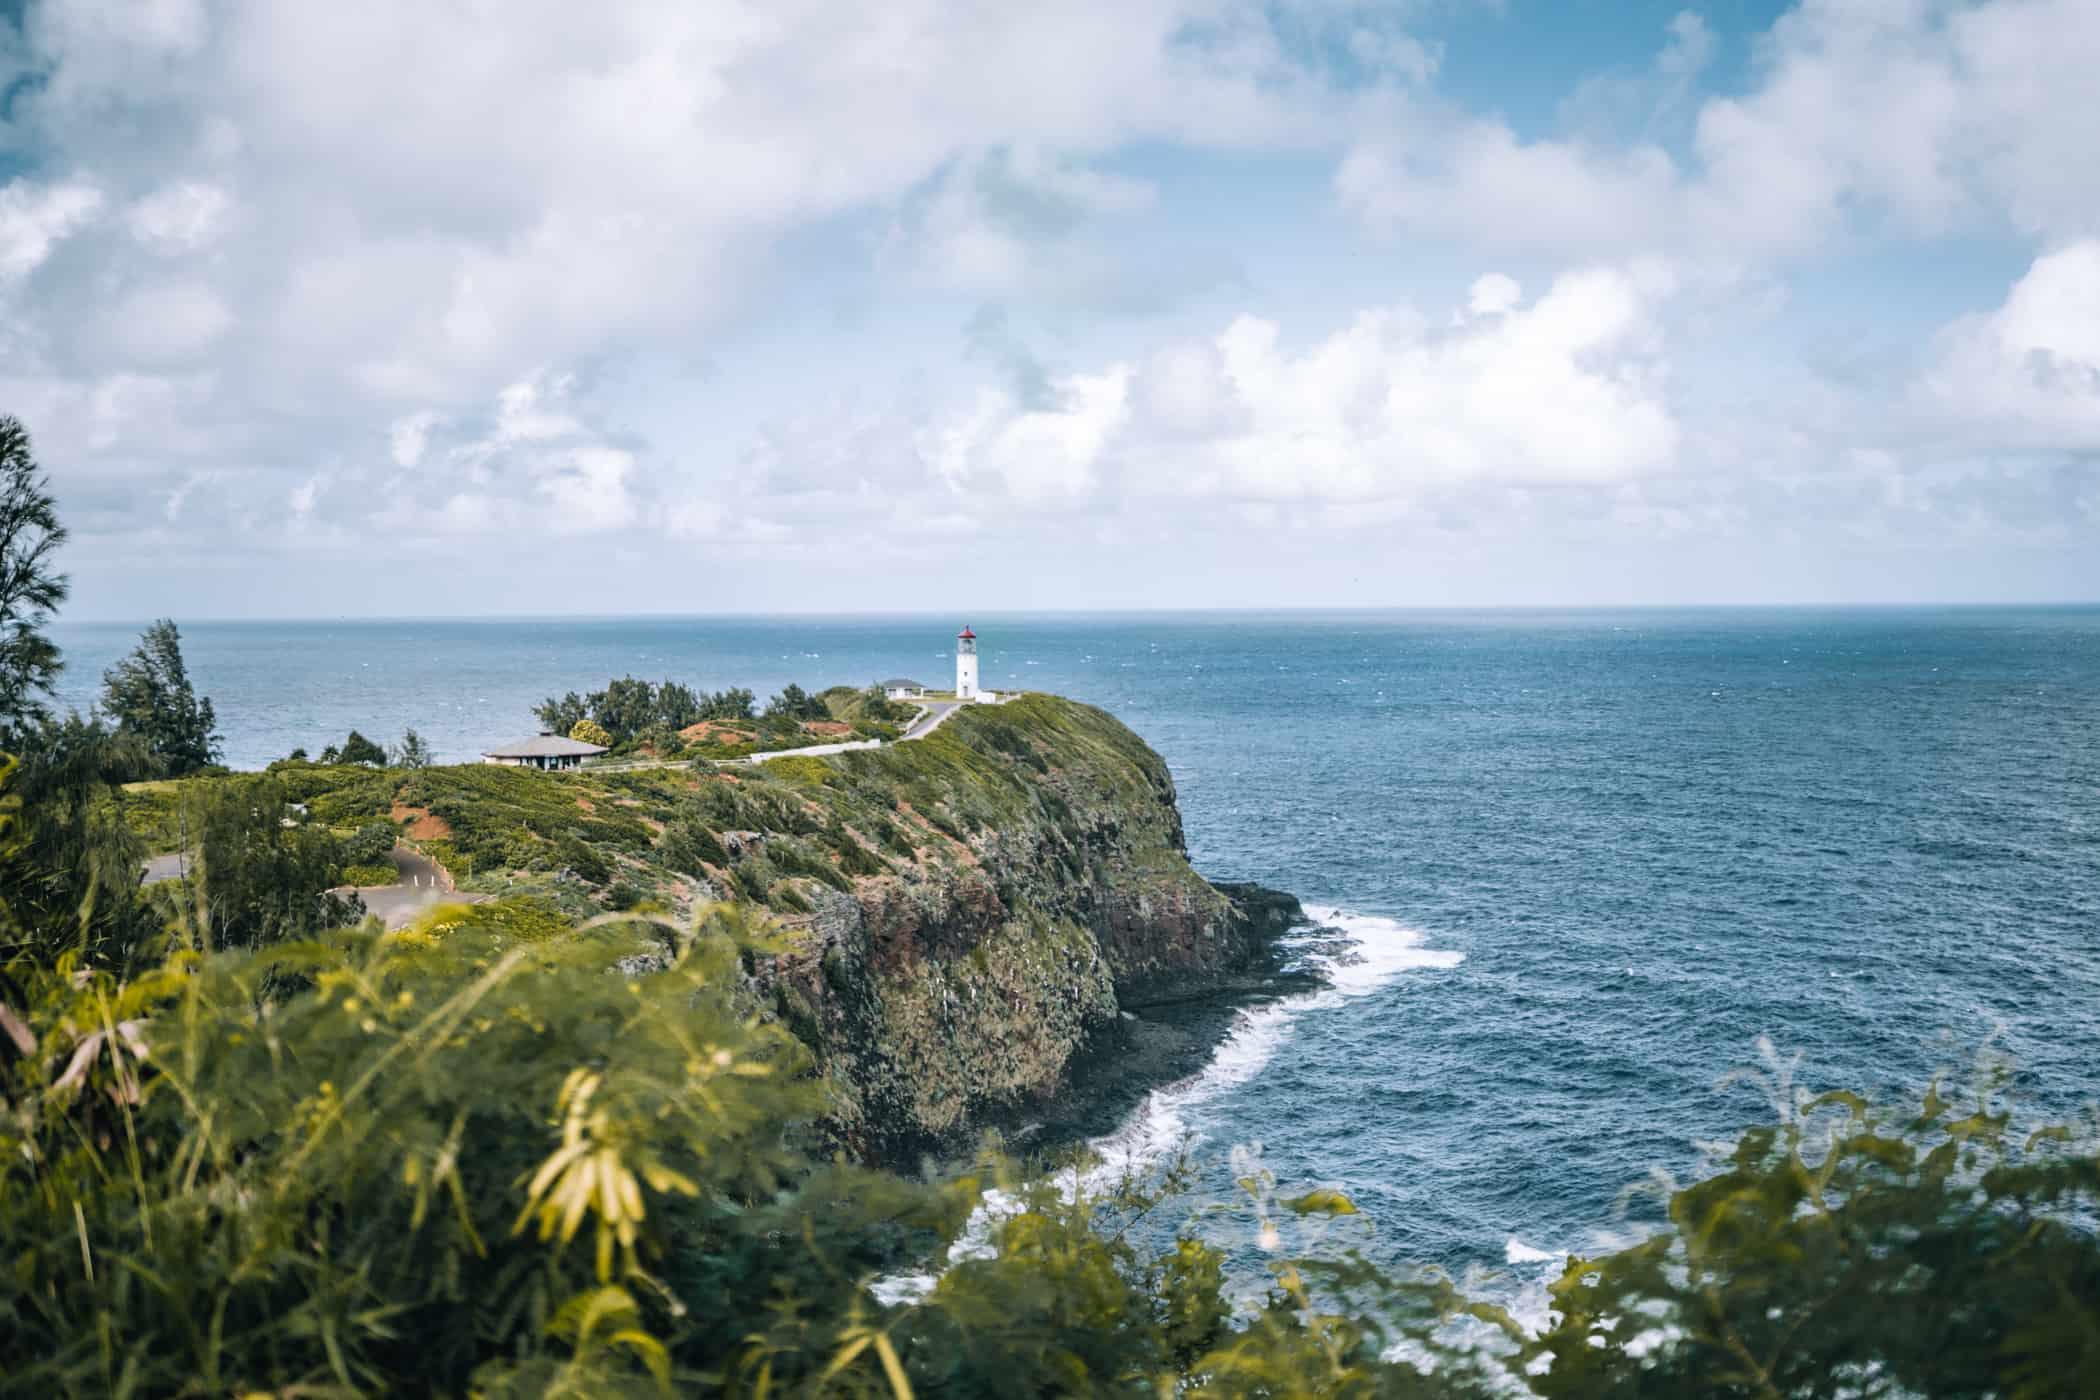 Kauai - Strände, Wandern & Ausflugsziele: Kilauea Lighthouse